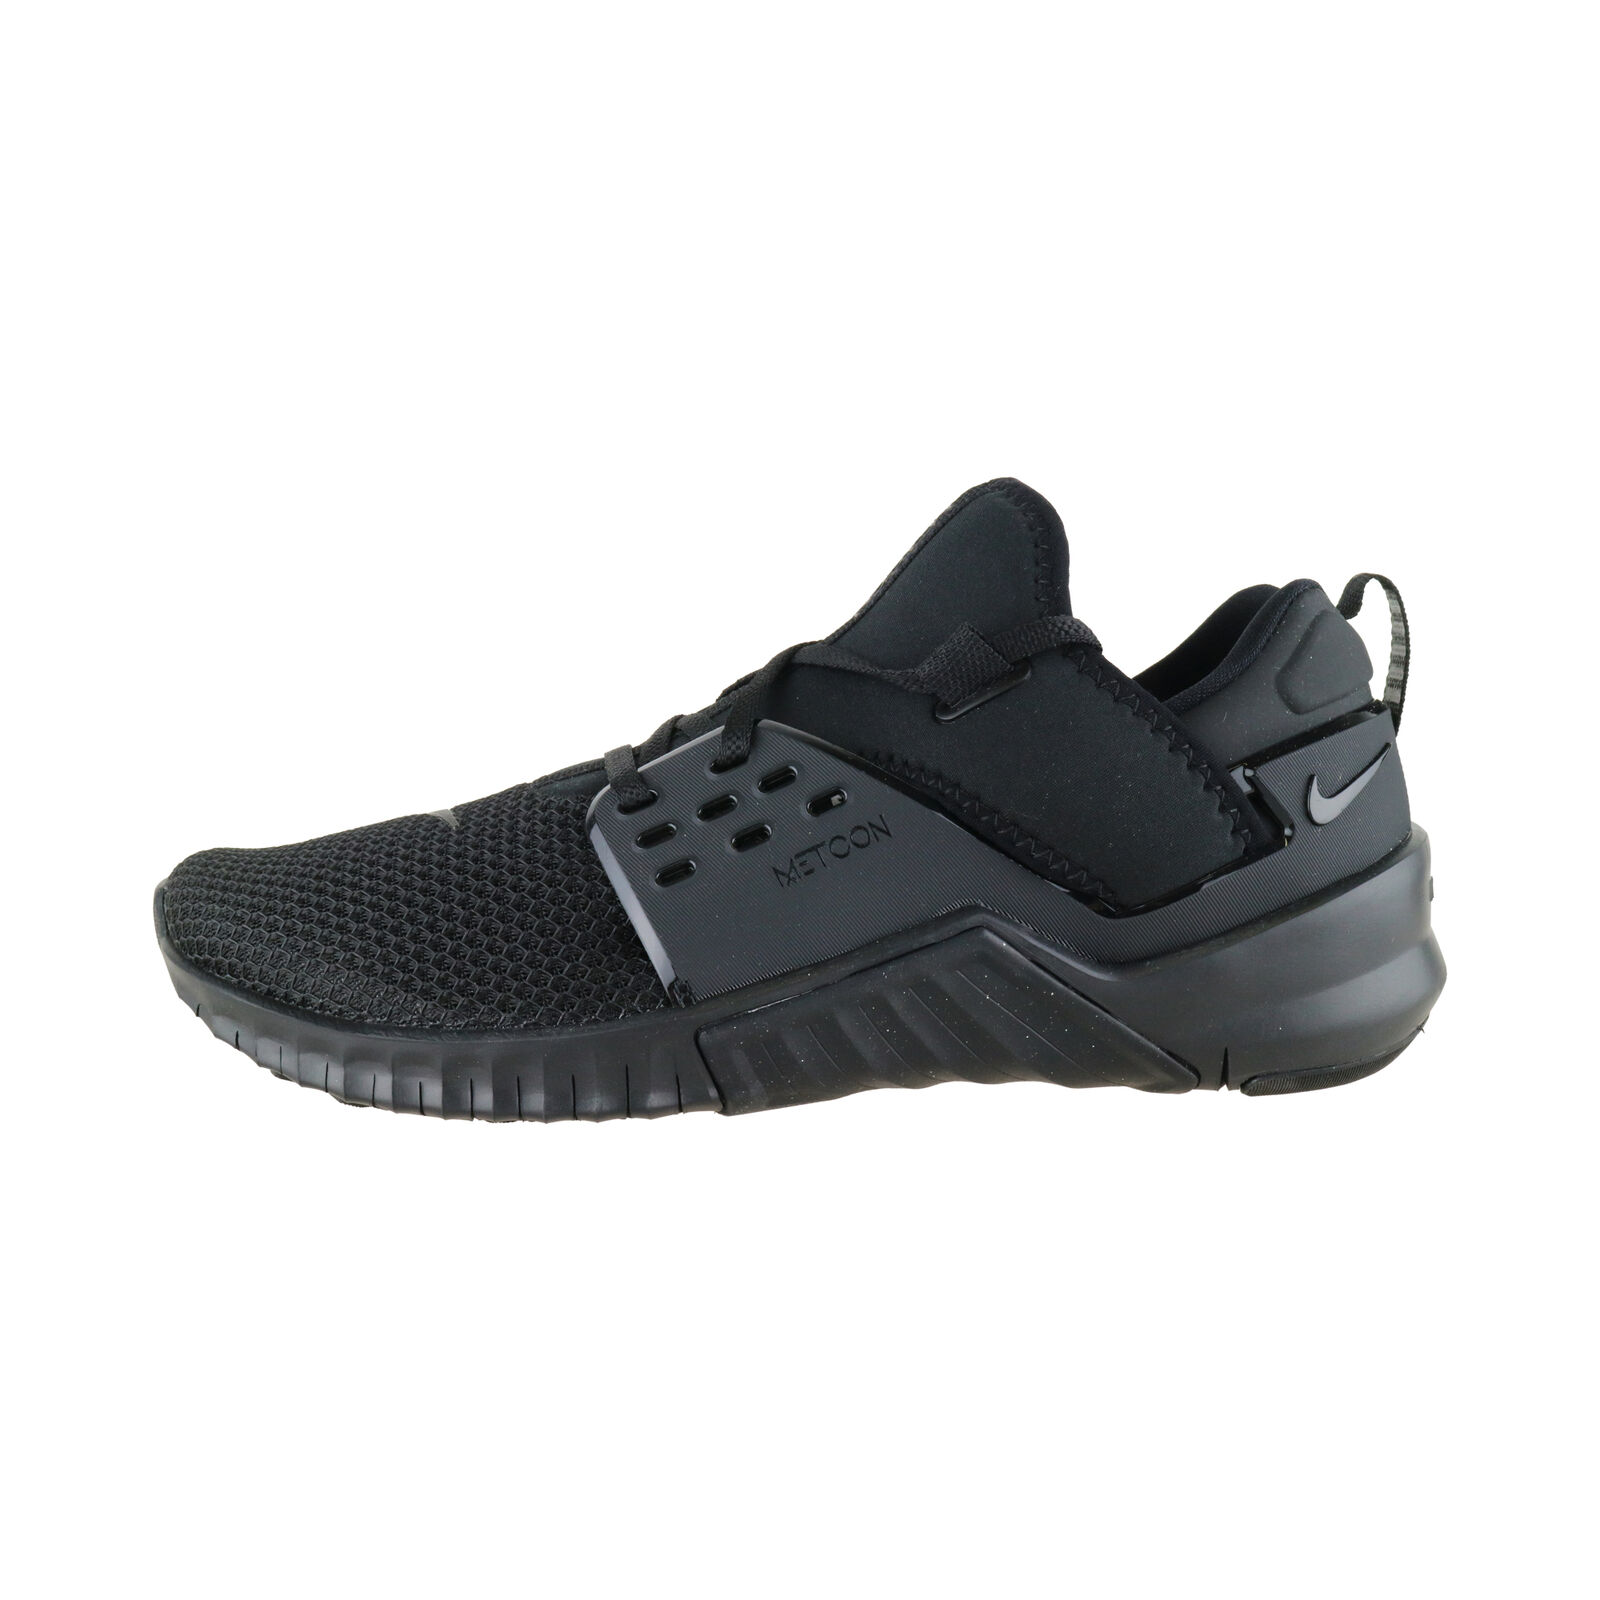 Nike Free metcon 2 Noir aq8306-002